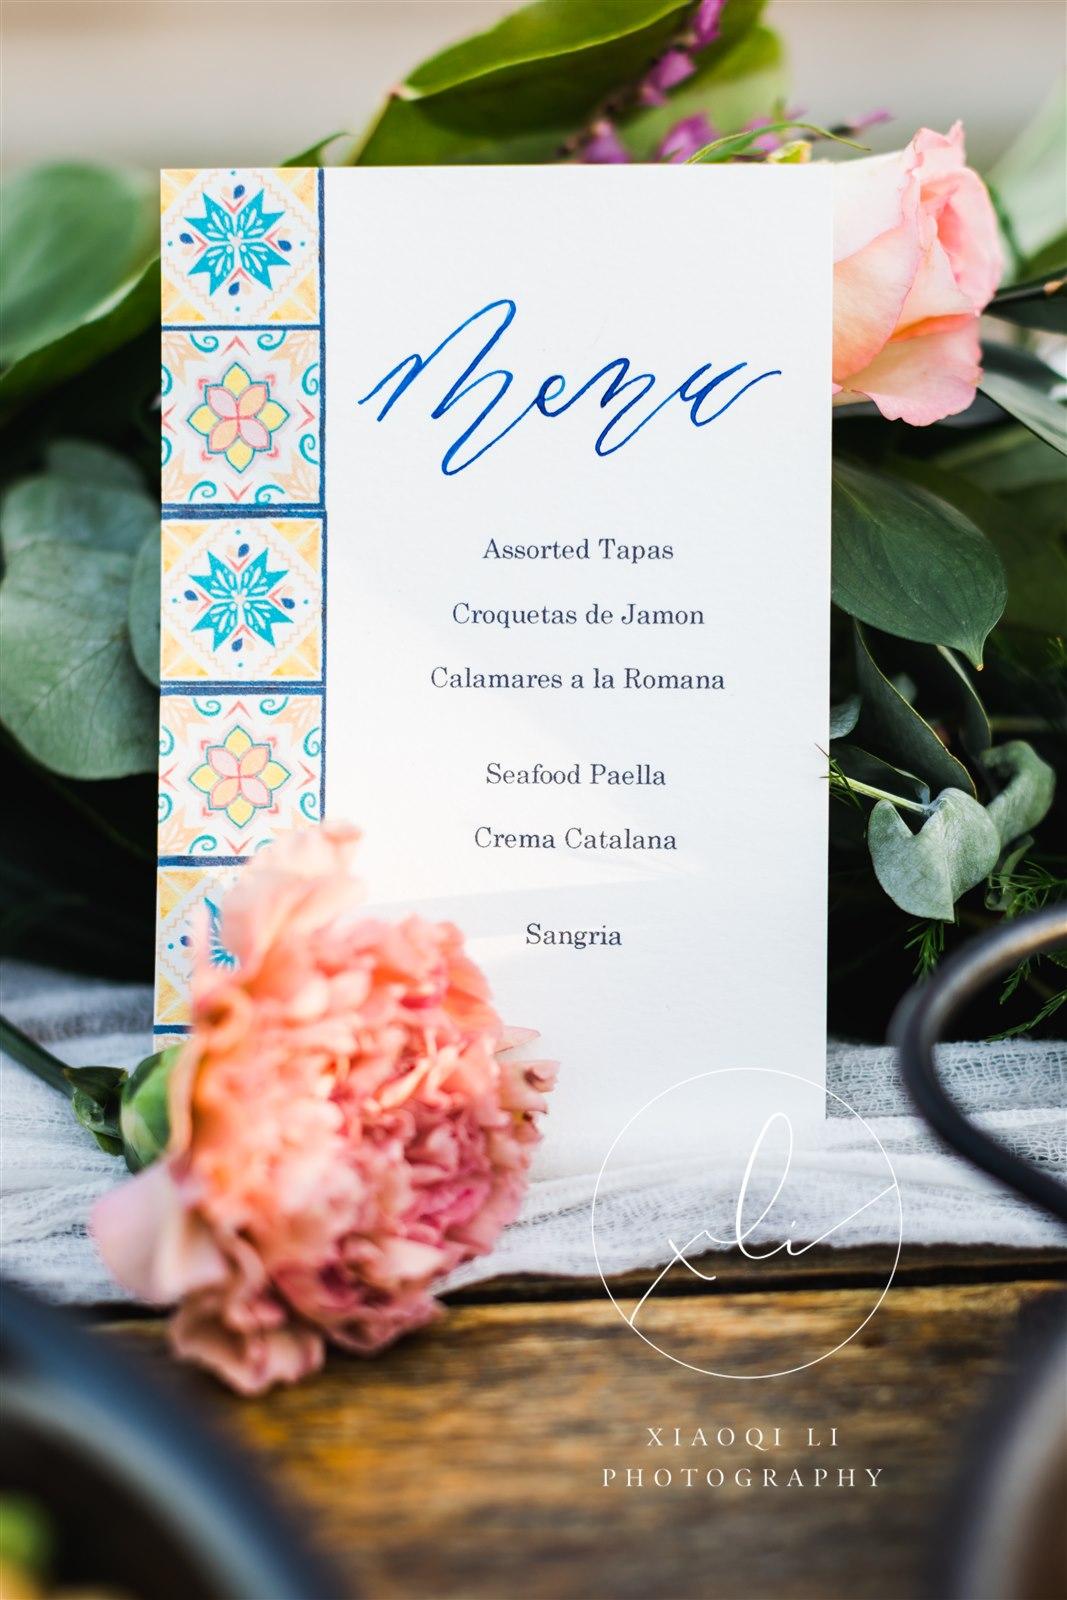 Xiaoqi-Li-Photography-Vendors-San-Antonio-Spanish-Inspired-Styled-Wedding-Gallery-114.jpg